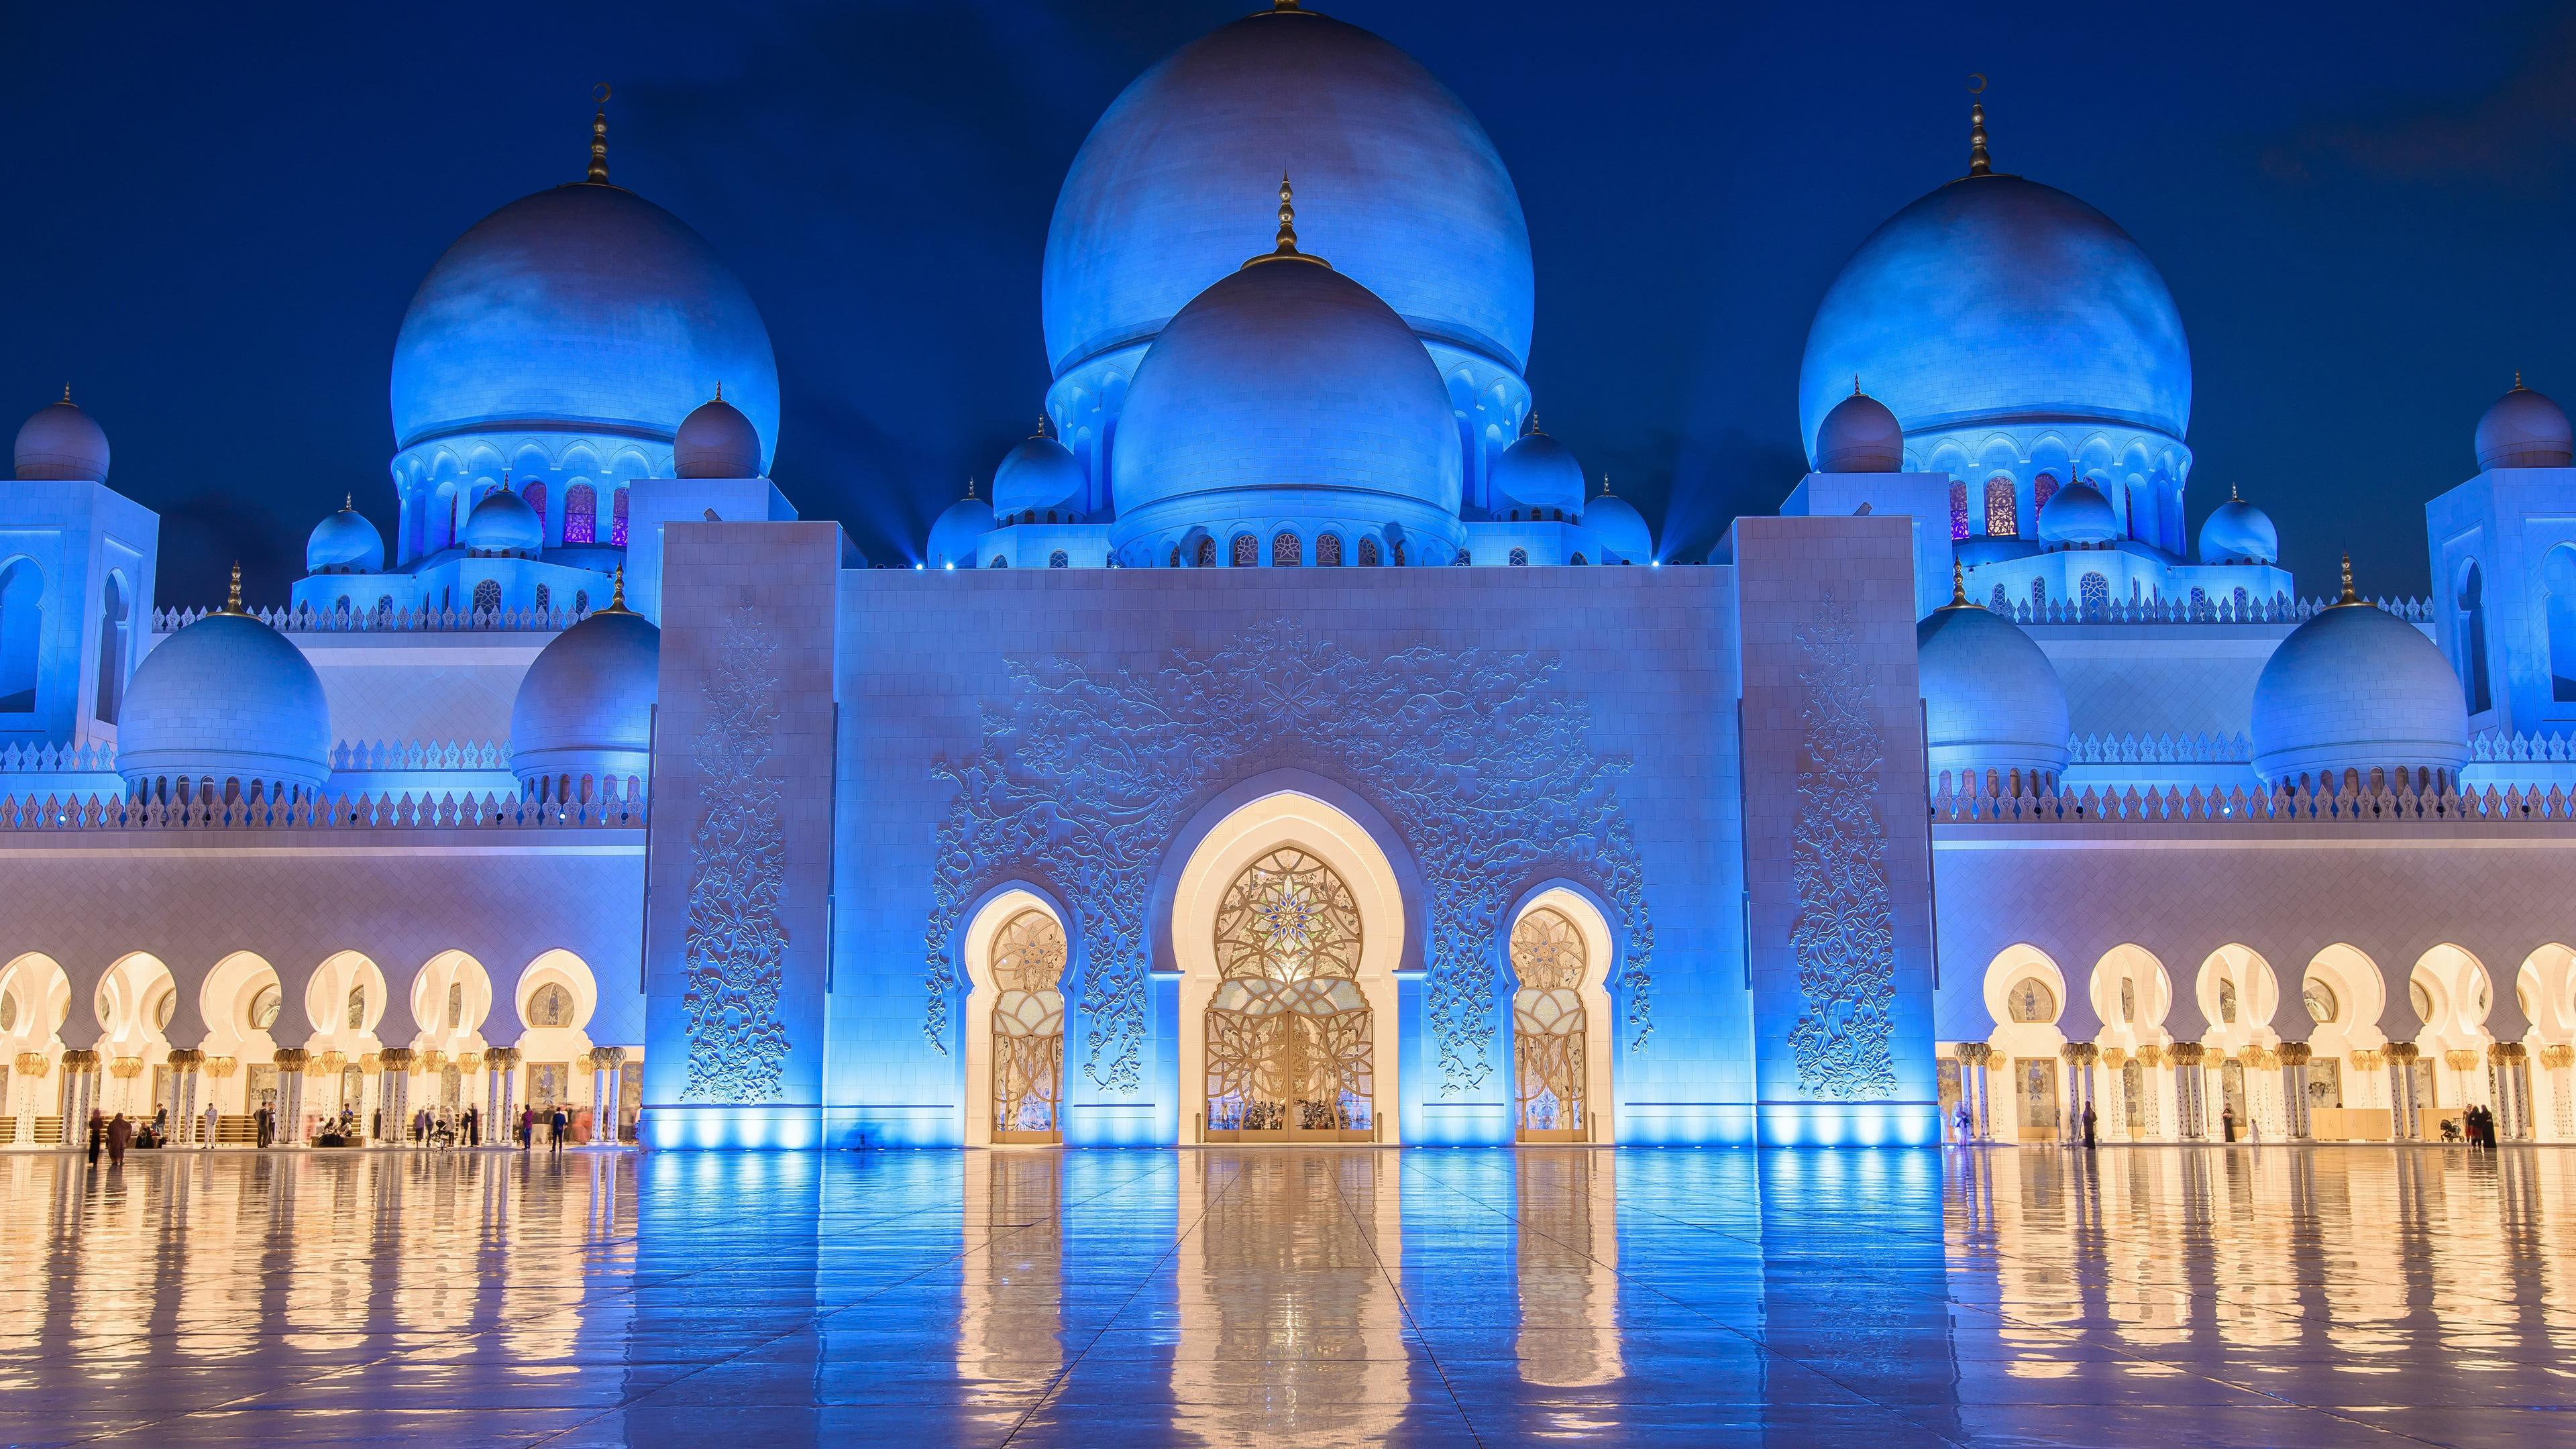 sheikh zayed mosque at night abu dhabi united arab emirates uhd 4k wallpaper